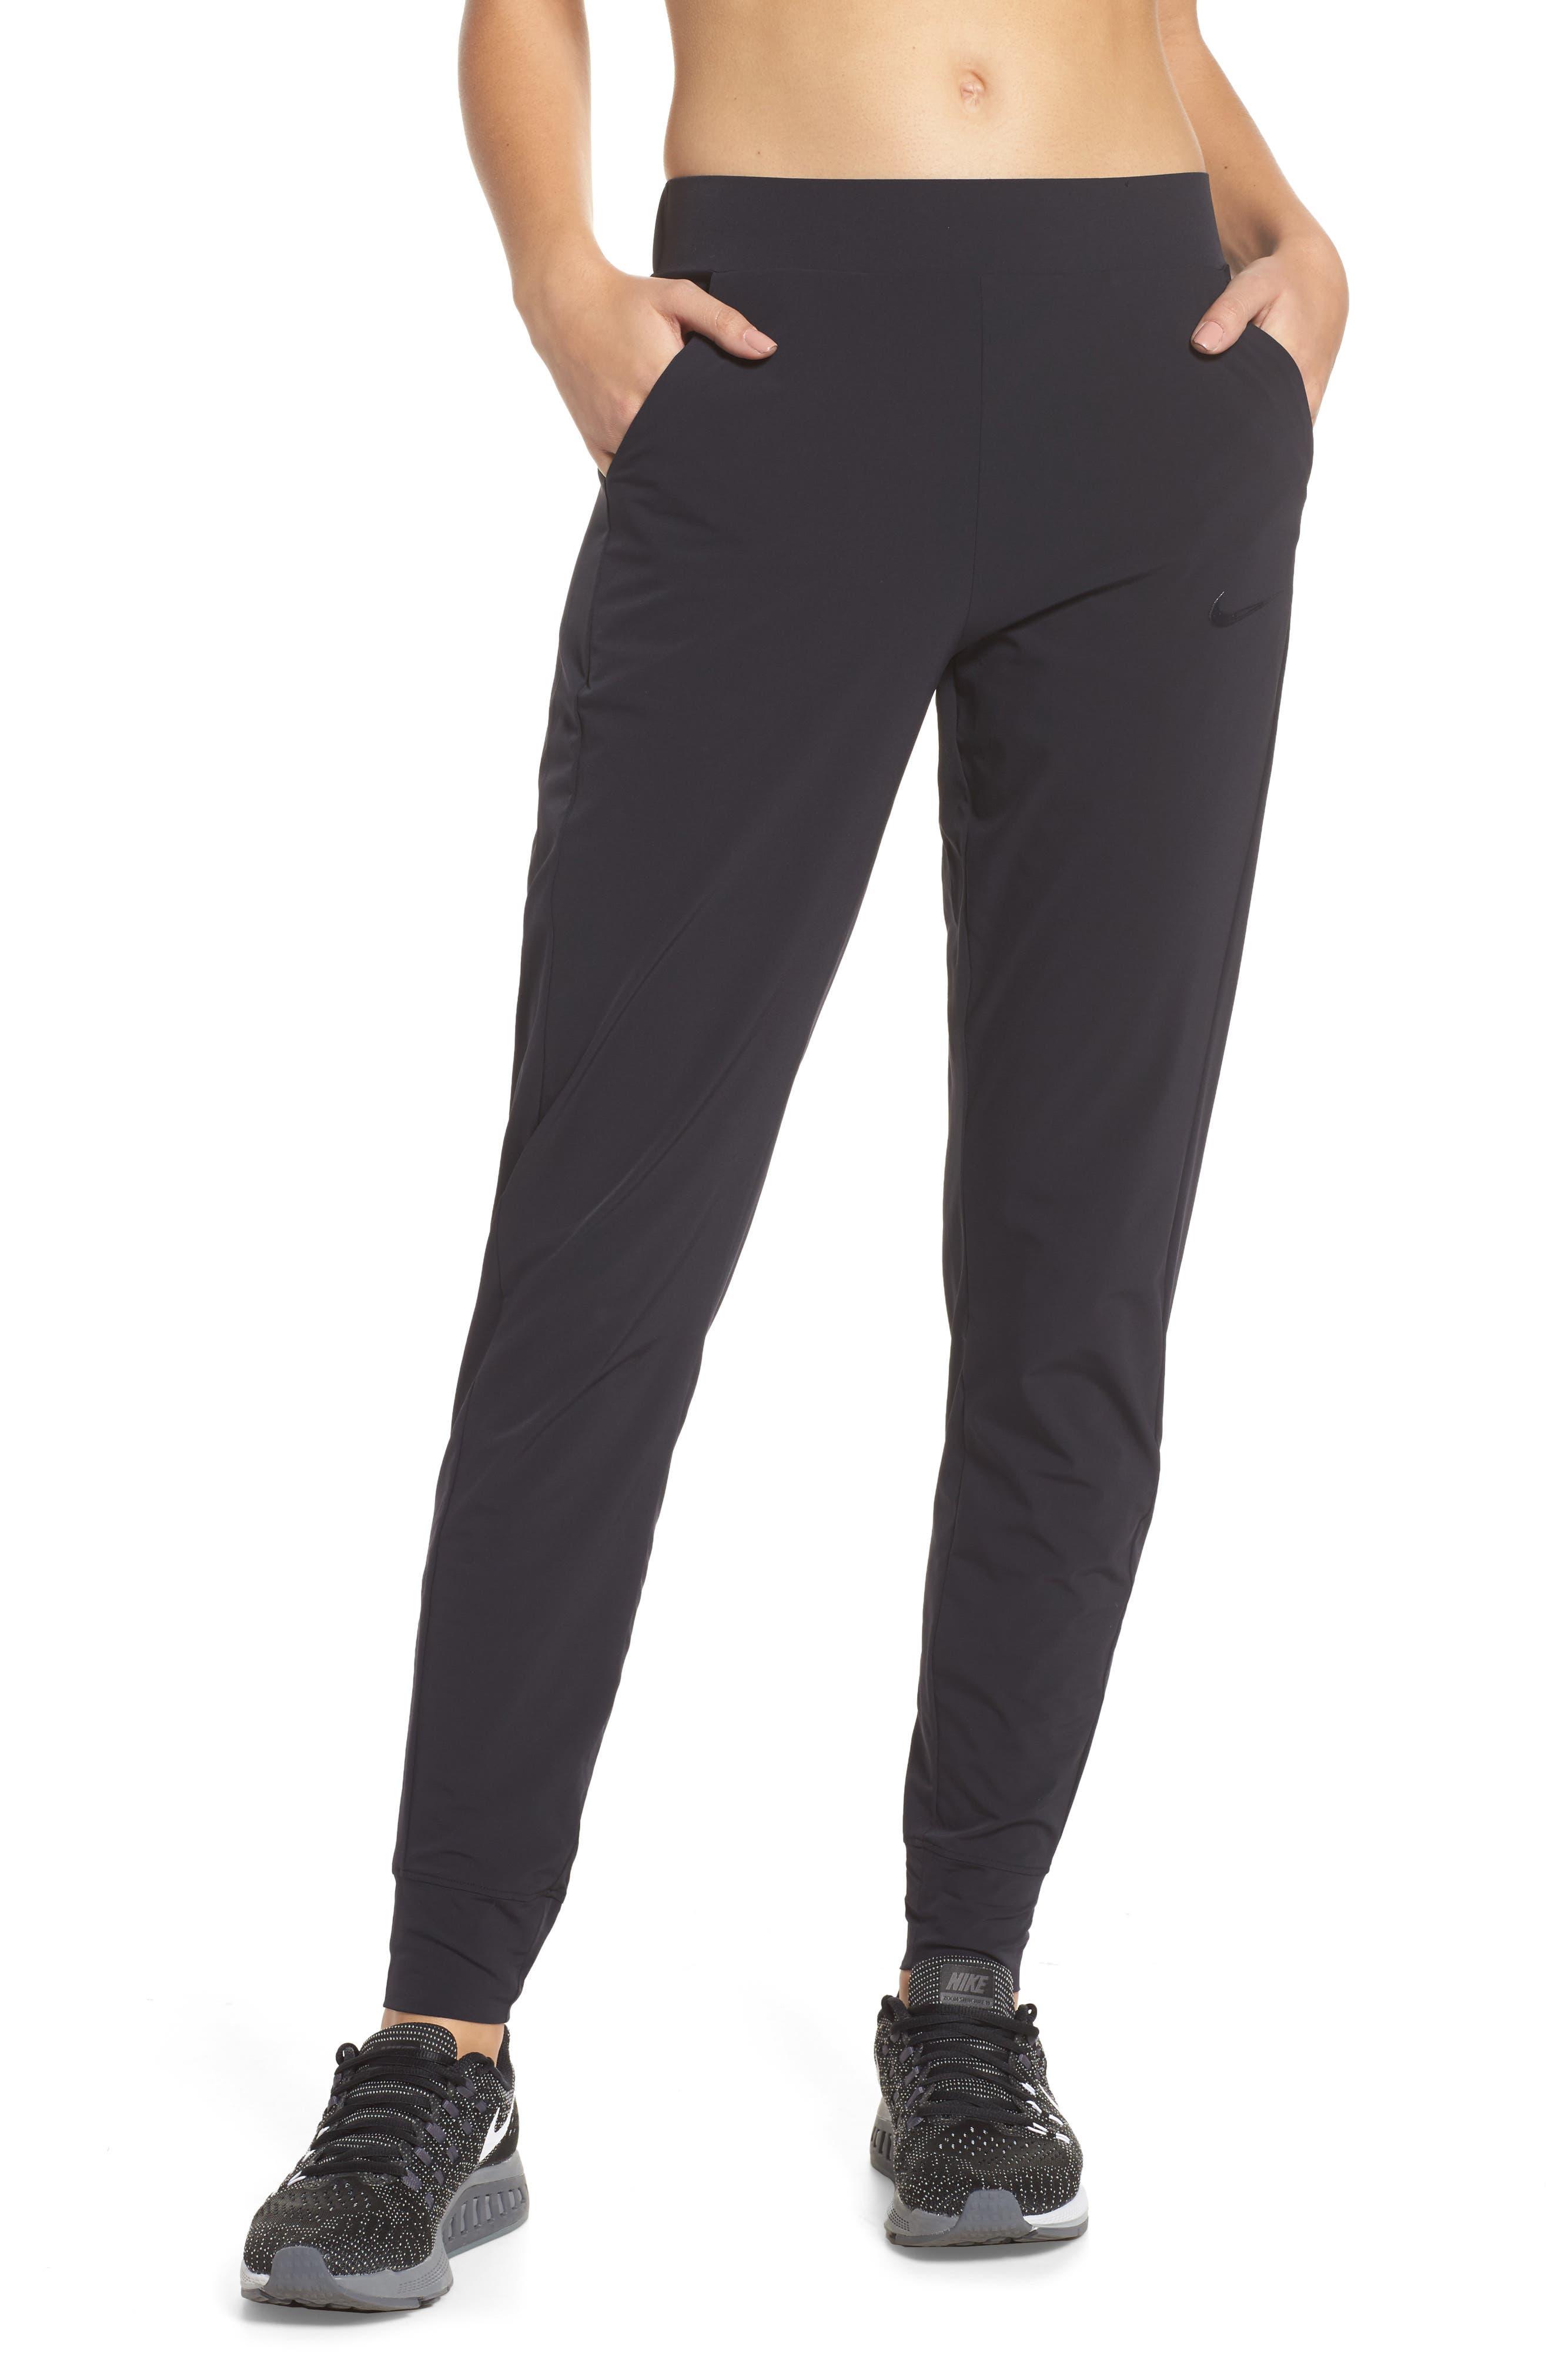 Bliss Training Pants,                             Main thumbnail 1, color,                             BLACK/ CLEAR